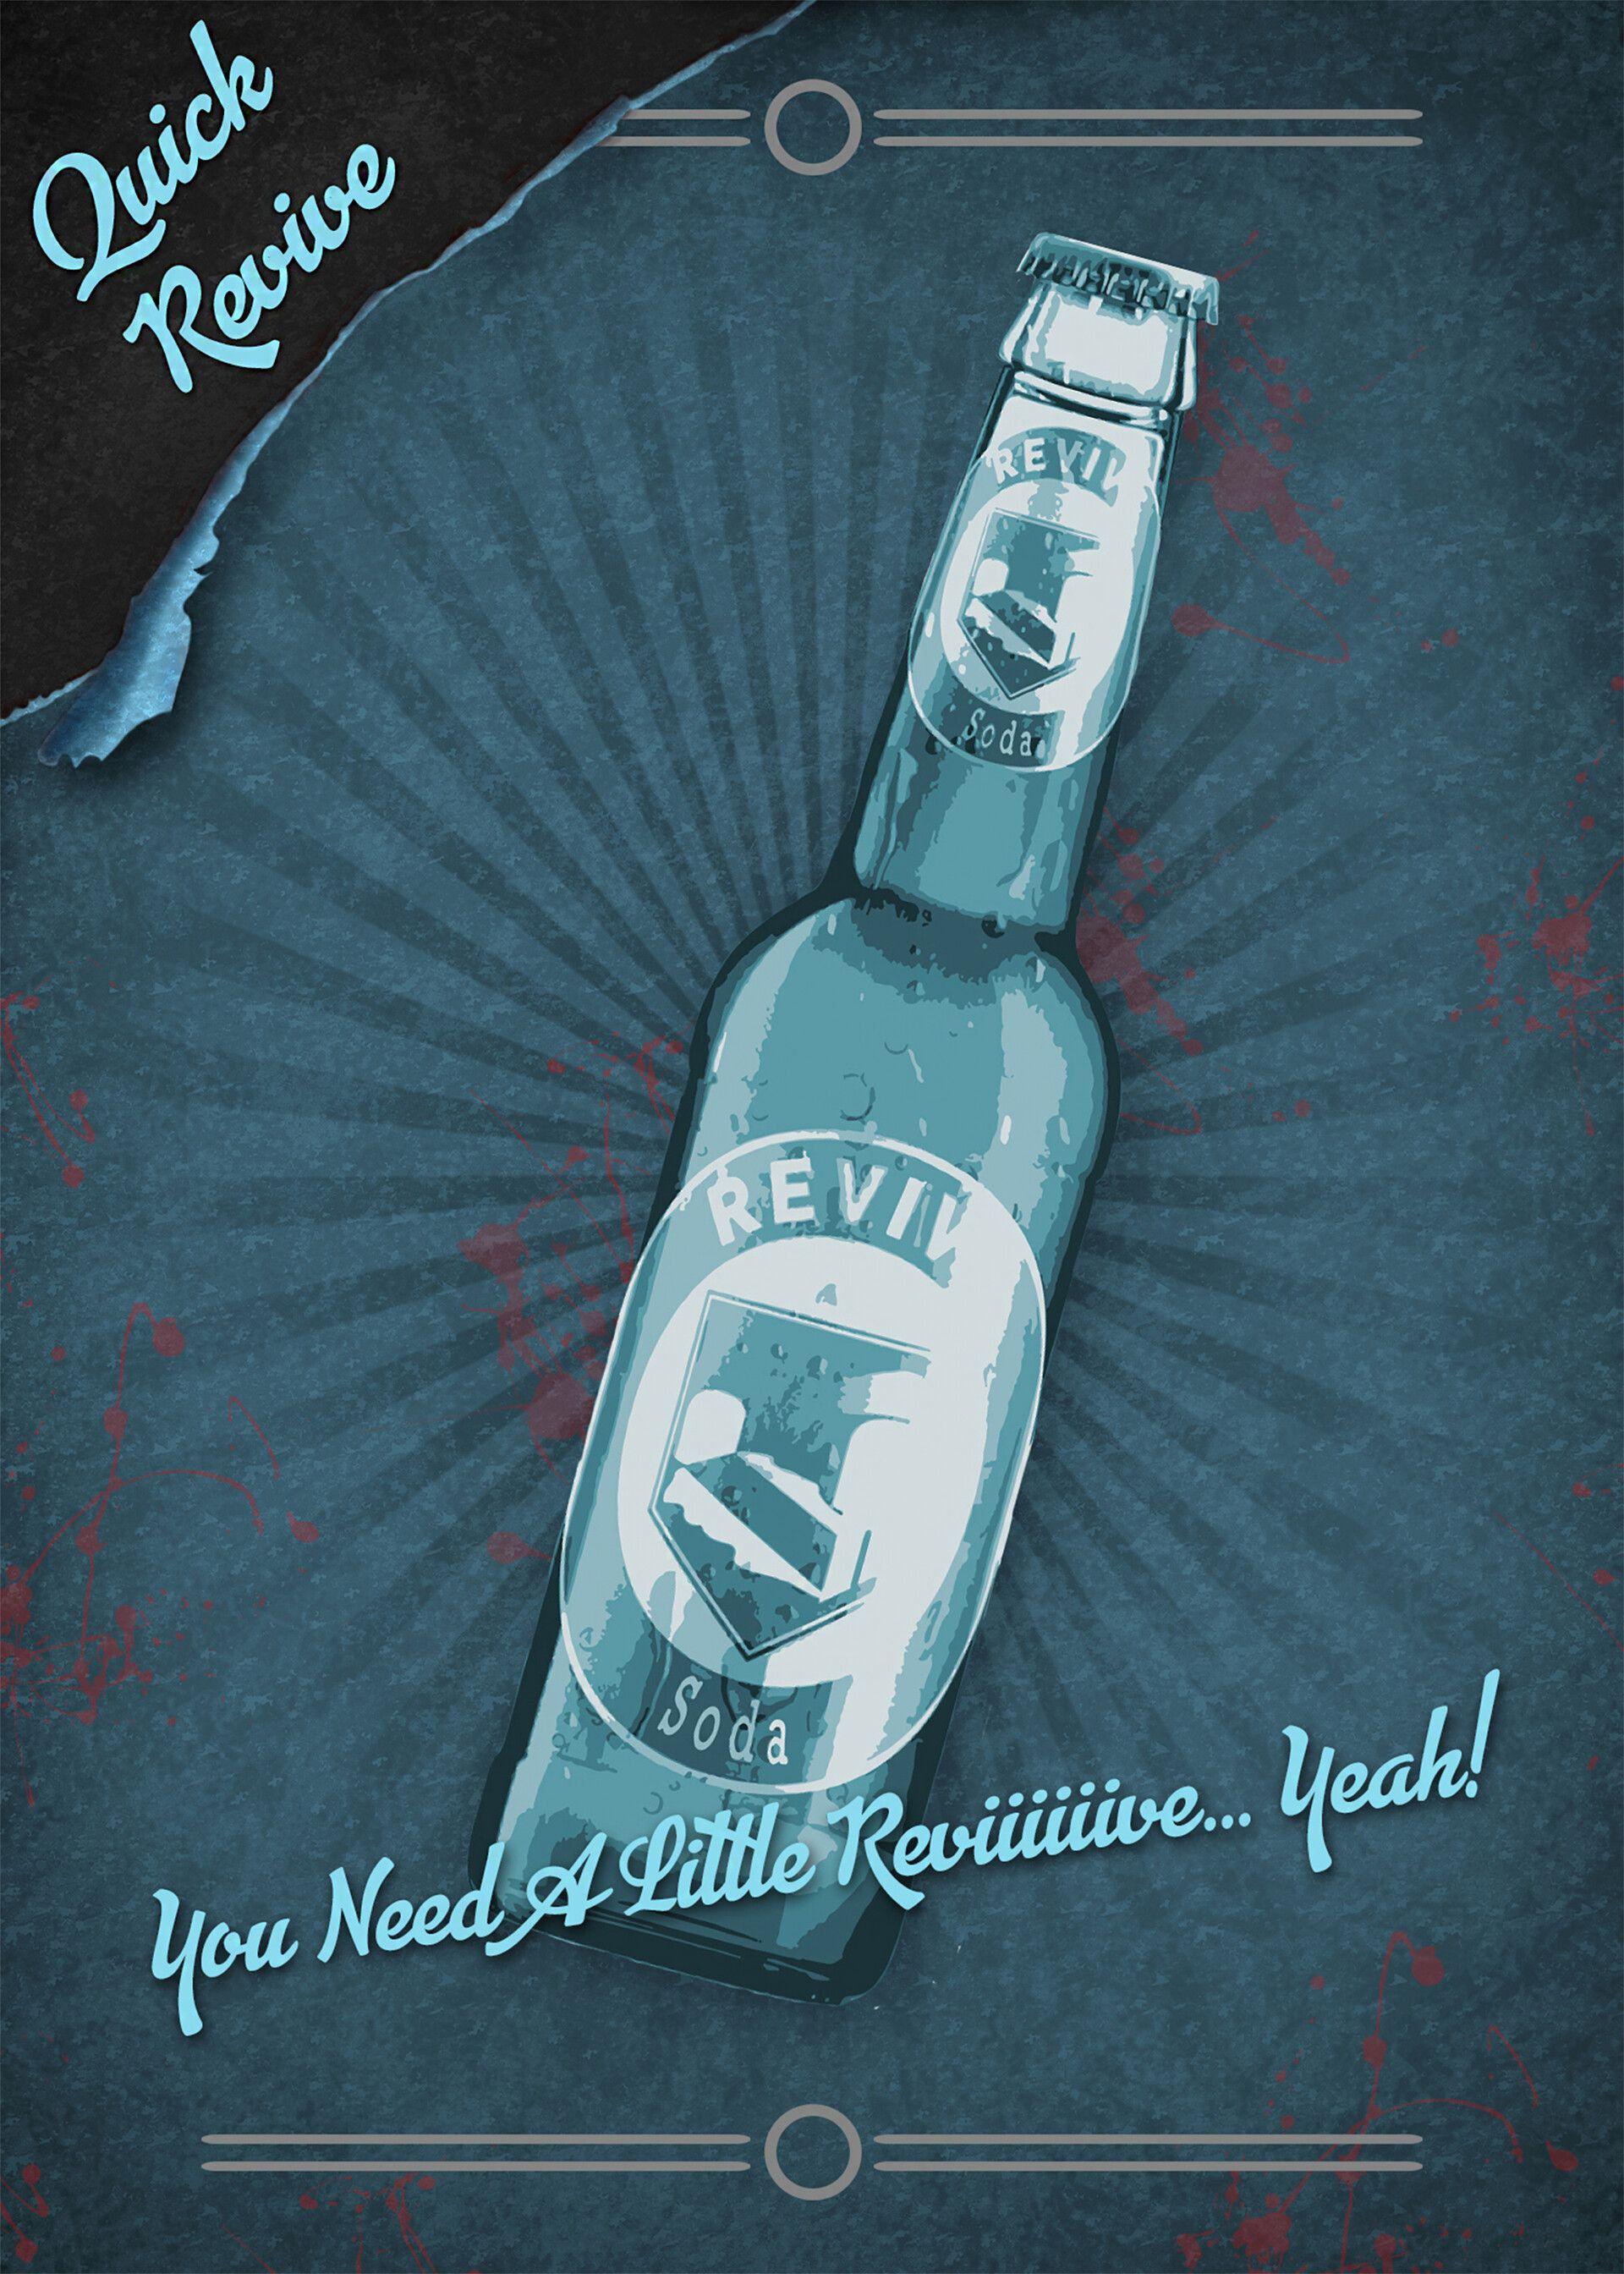 Artstation Call Of Duty Quick Revive Perk Poster David Hyde In 2020 Call Of Duty Zombies Call Of Duty Call Of Duty Perks